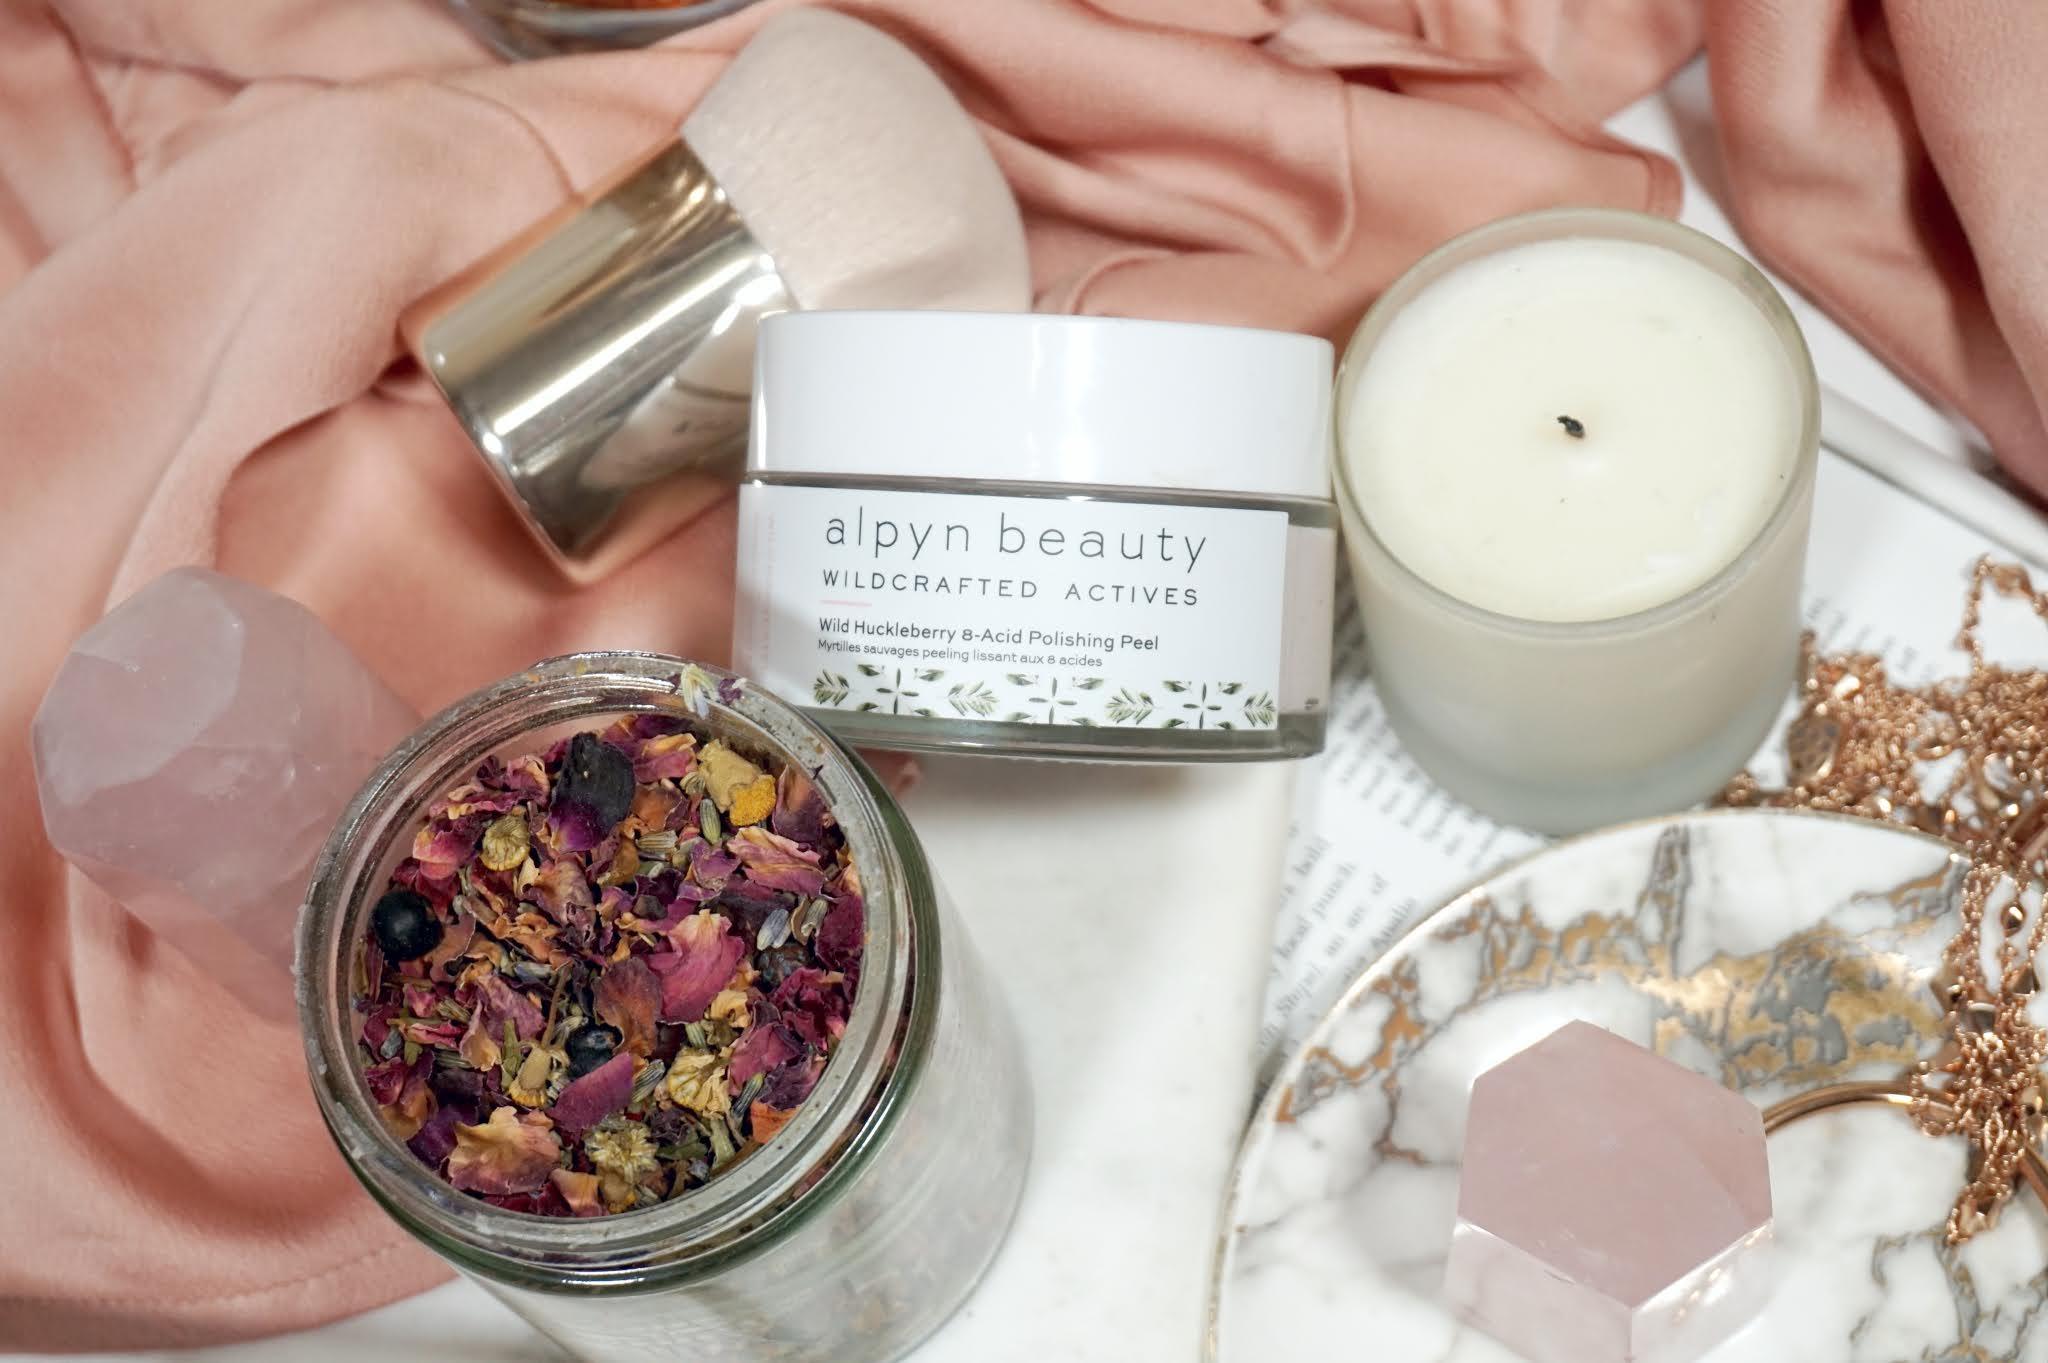 Alpyn Beauty Wild Huckleberry 8-Acid Polishing Peel Mask Review